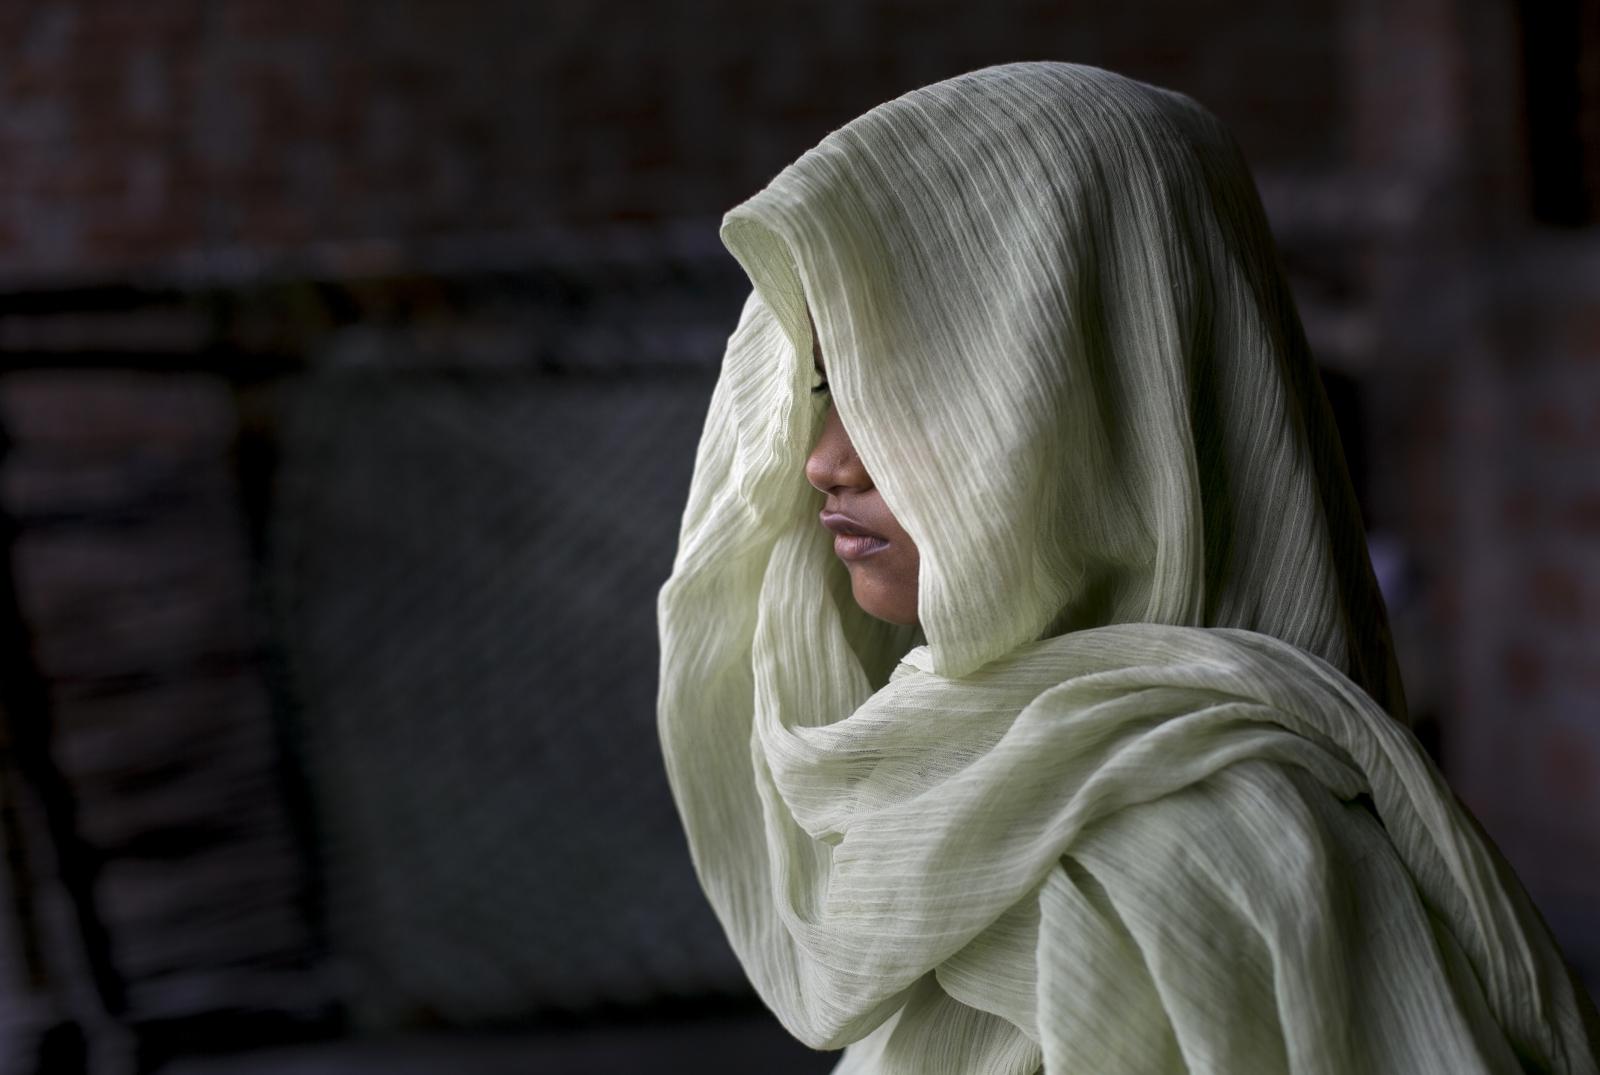 14-year-old rape victim